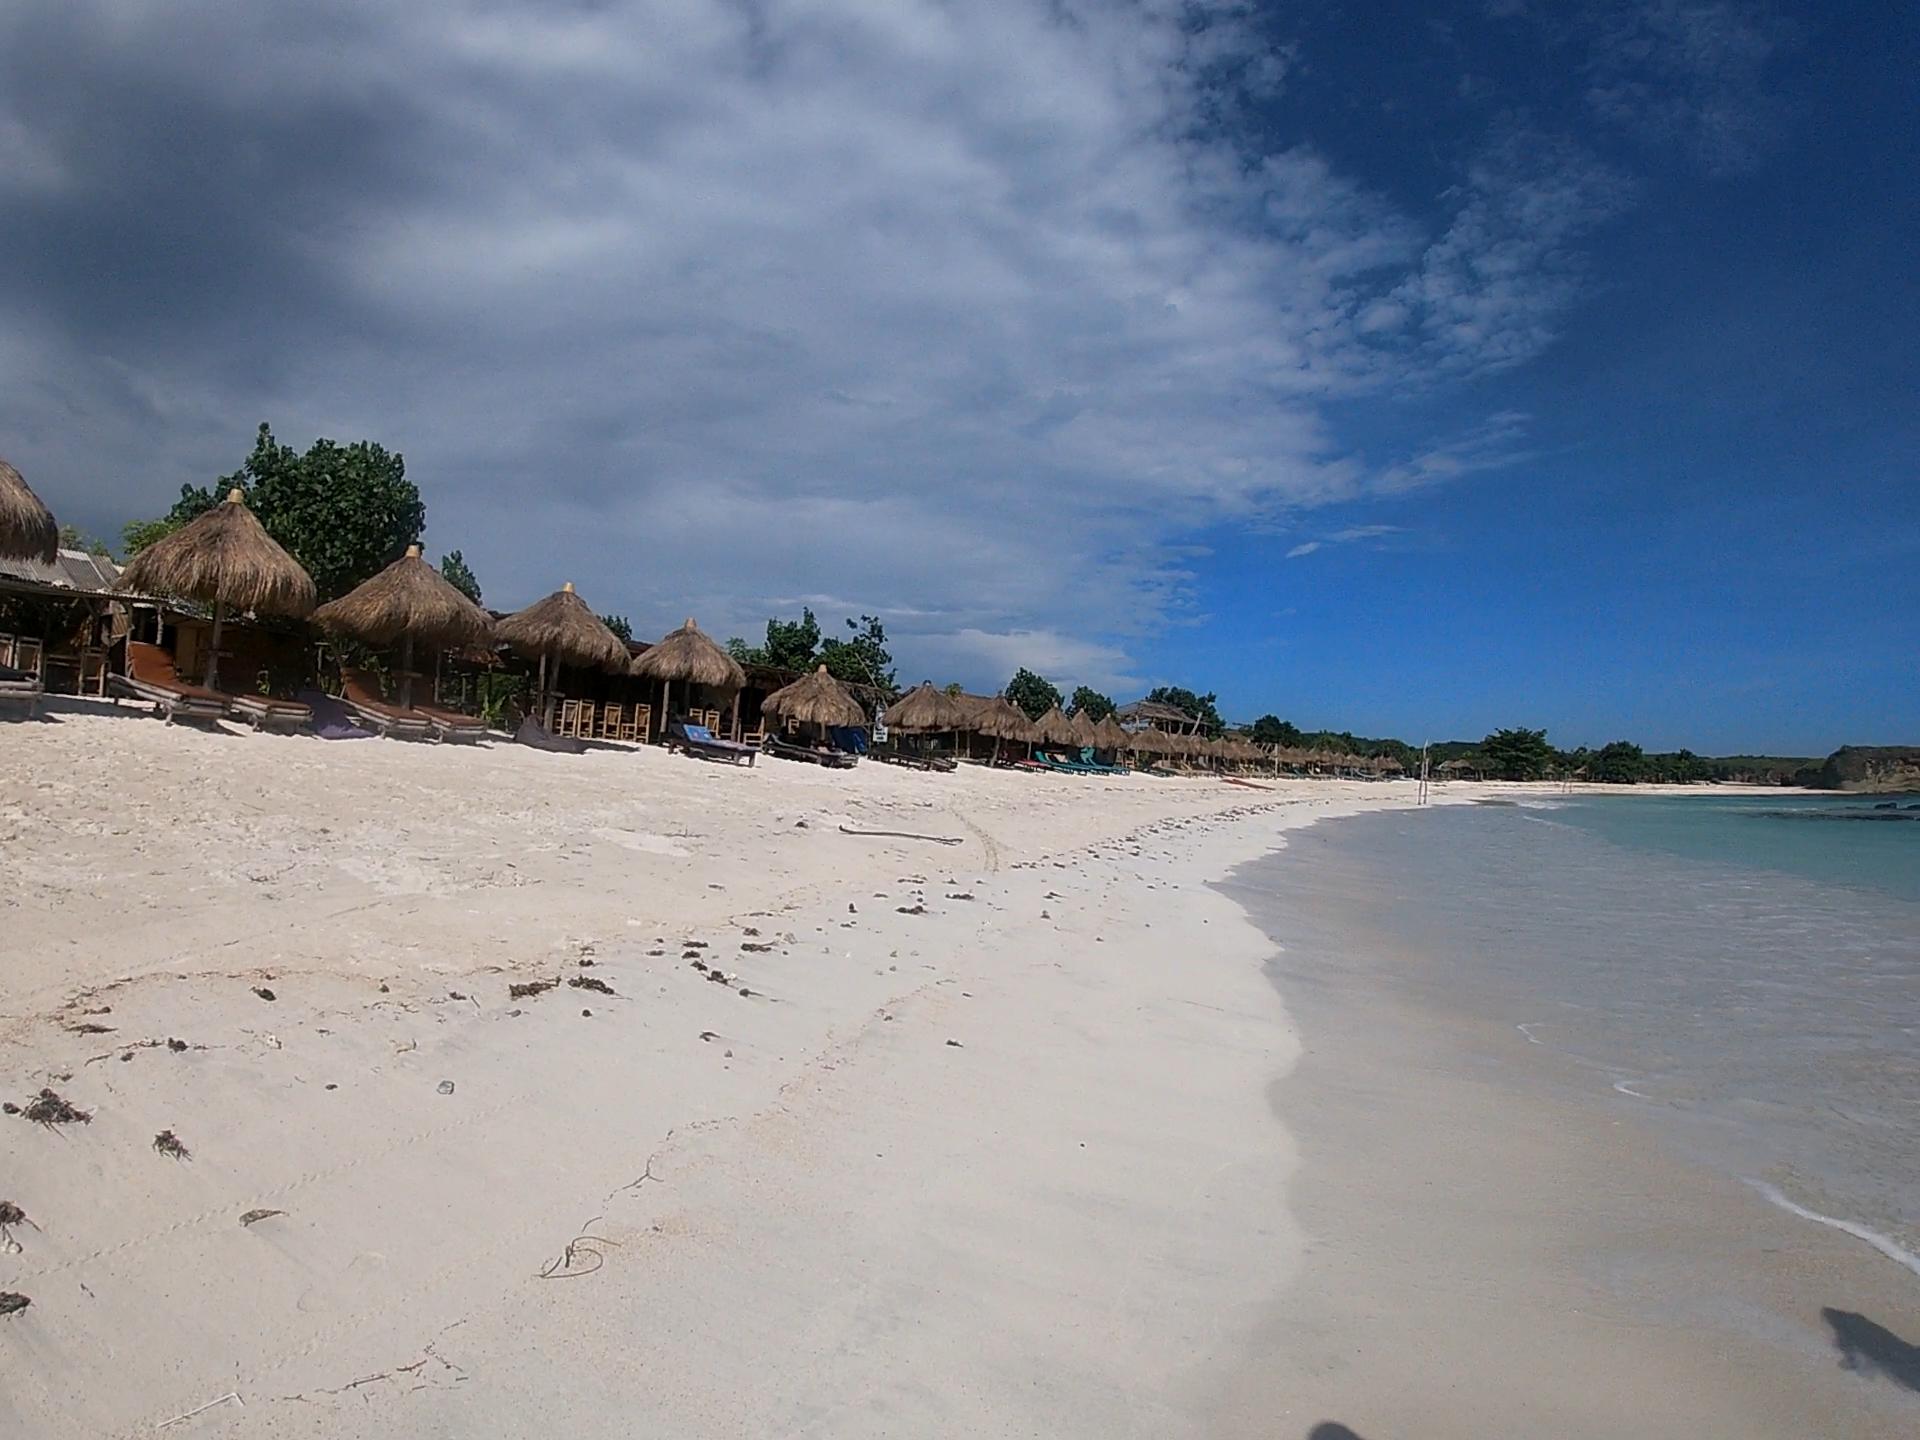 You are currently viewing Surfen in indonesischen Wellen [INDO]